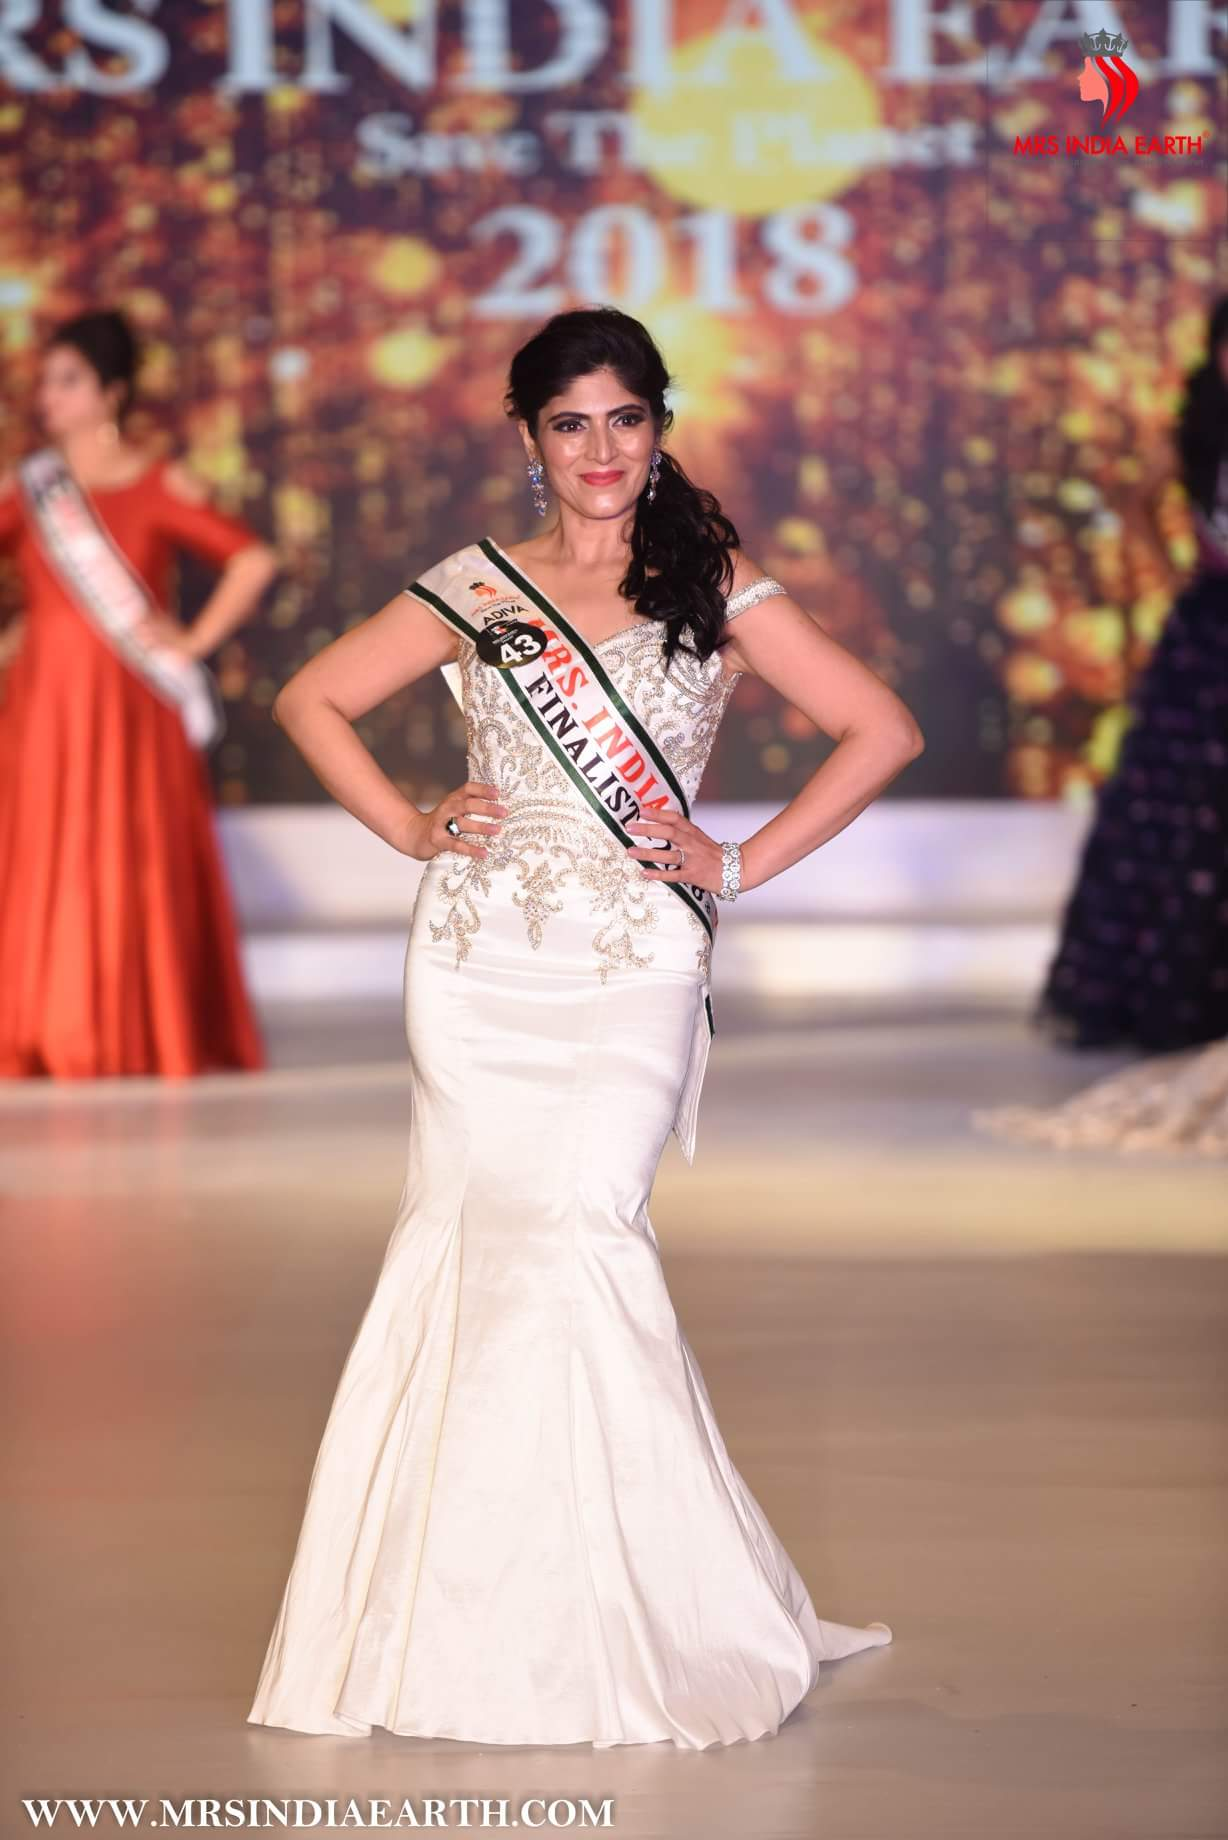 Sugandha Gopal Crowned Mrs India Earth Classic 2018